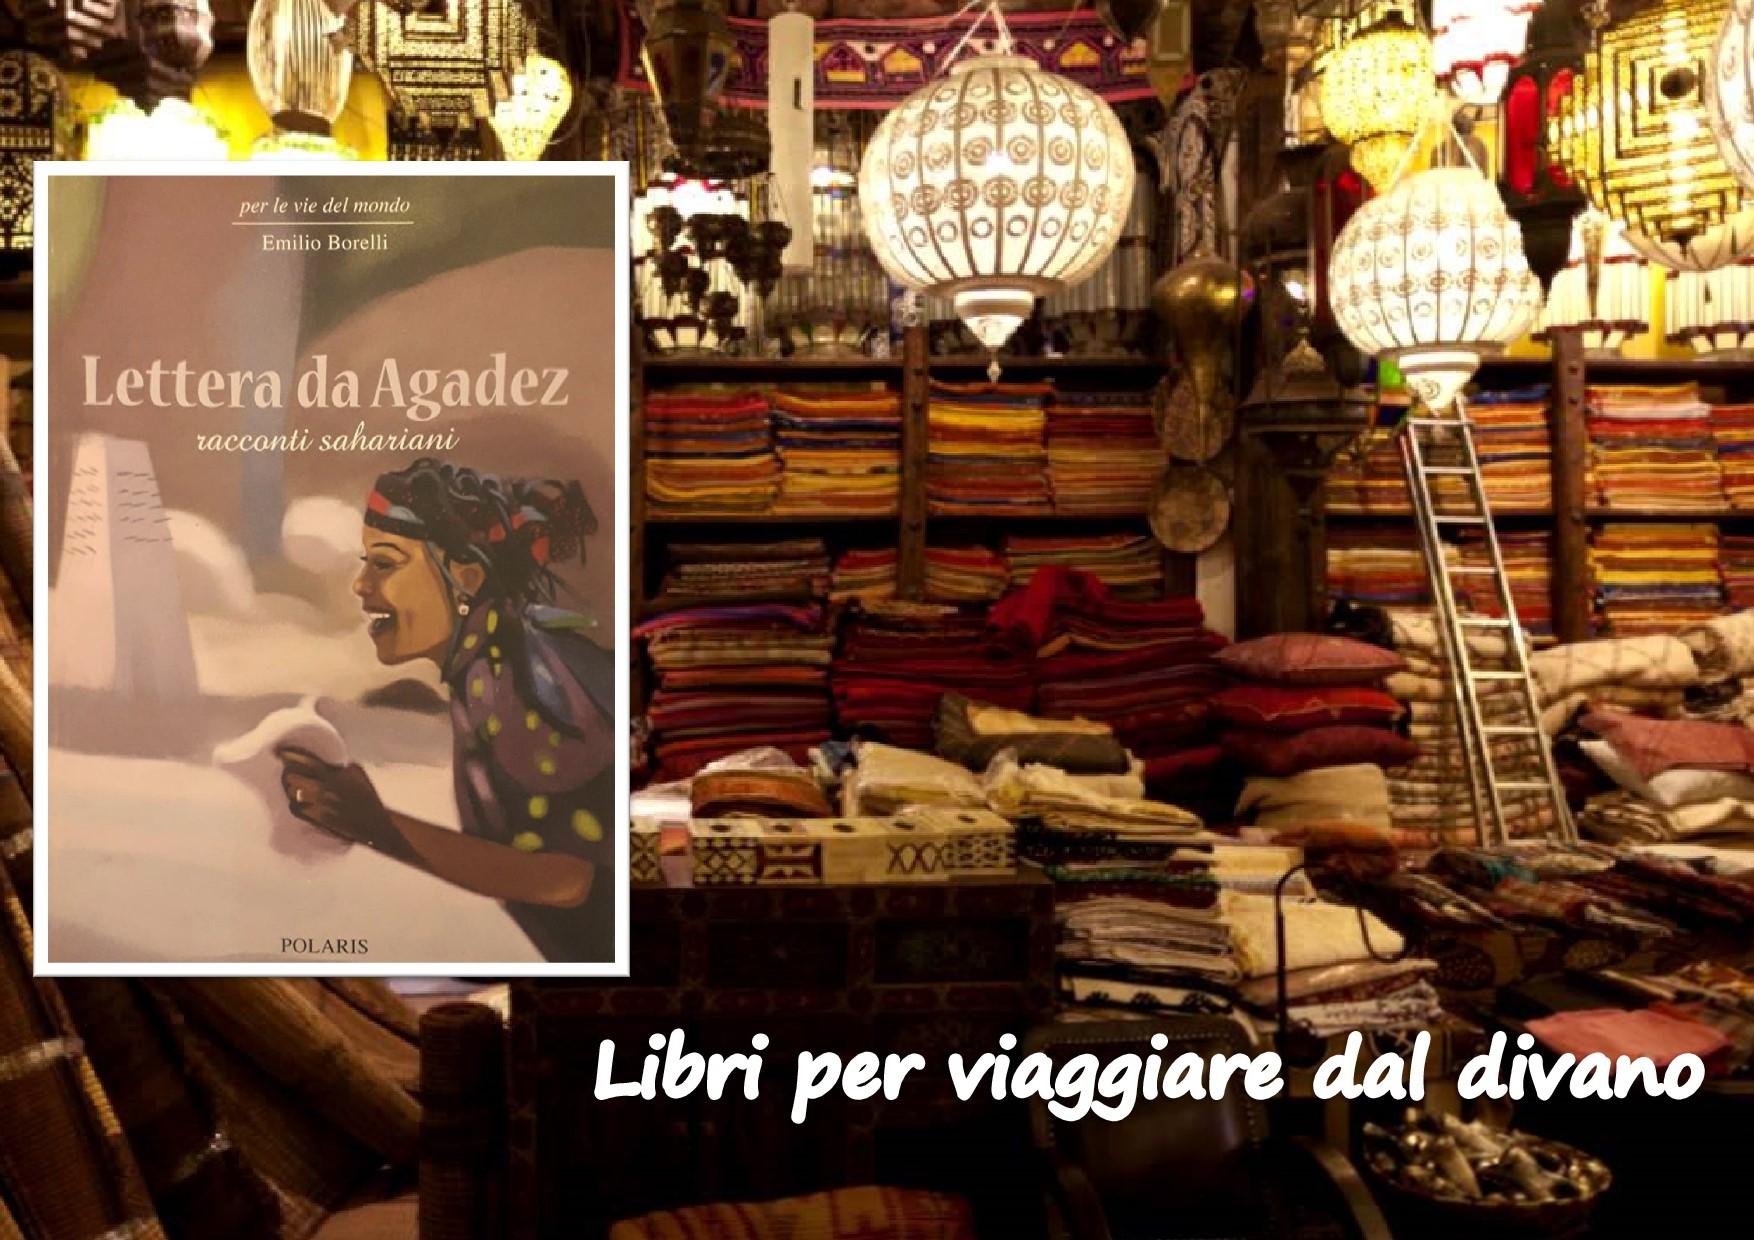 LETTERA DA AGADEZ - racconti sahariani di EMILIO BORELLI